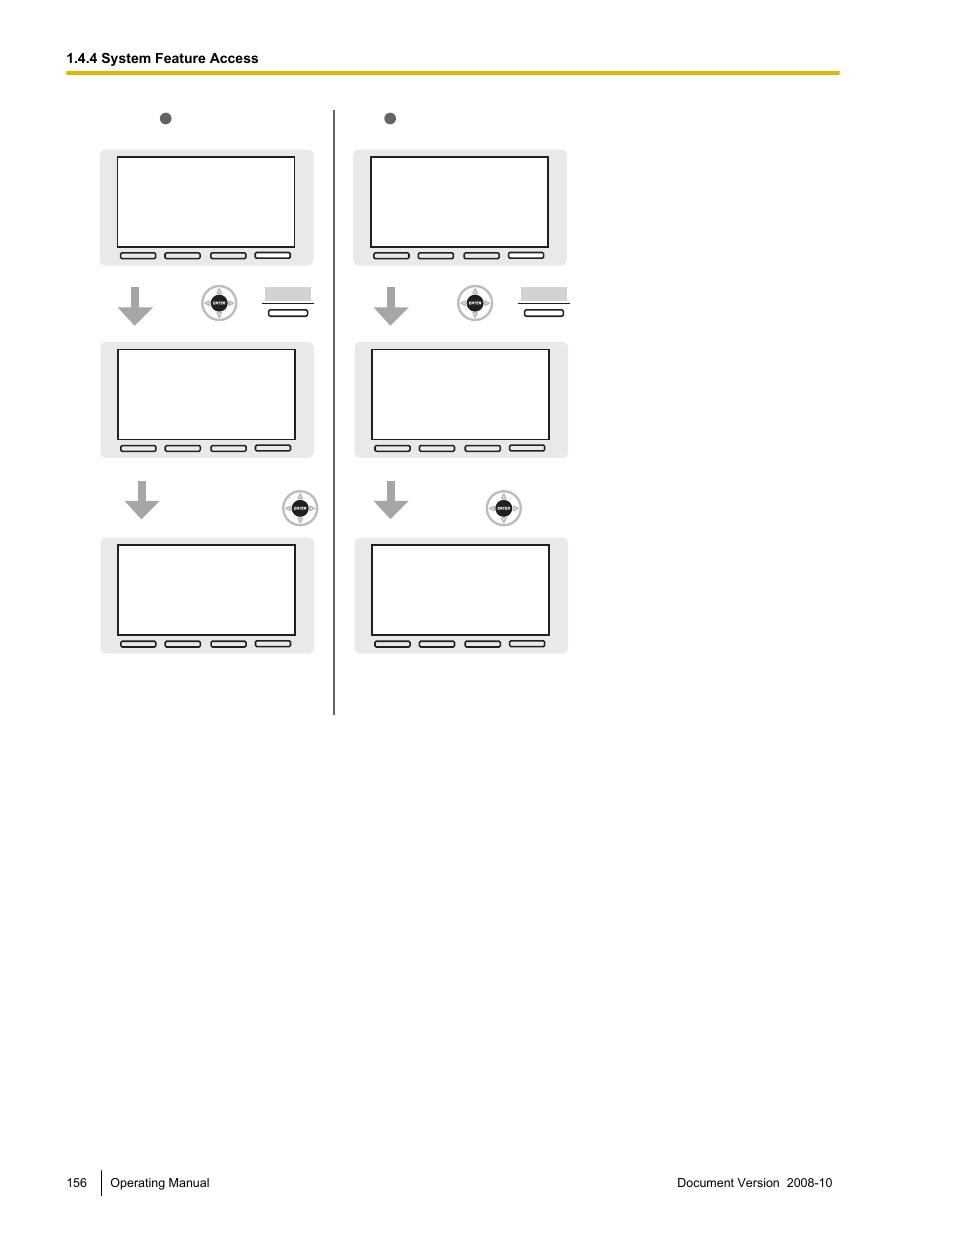 external relay on paging enter panasonic kx tde200 user manual rh manualsdir com panasonic kx-tde200 manual panasonic kx-tde200 installation manual